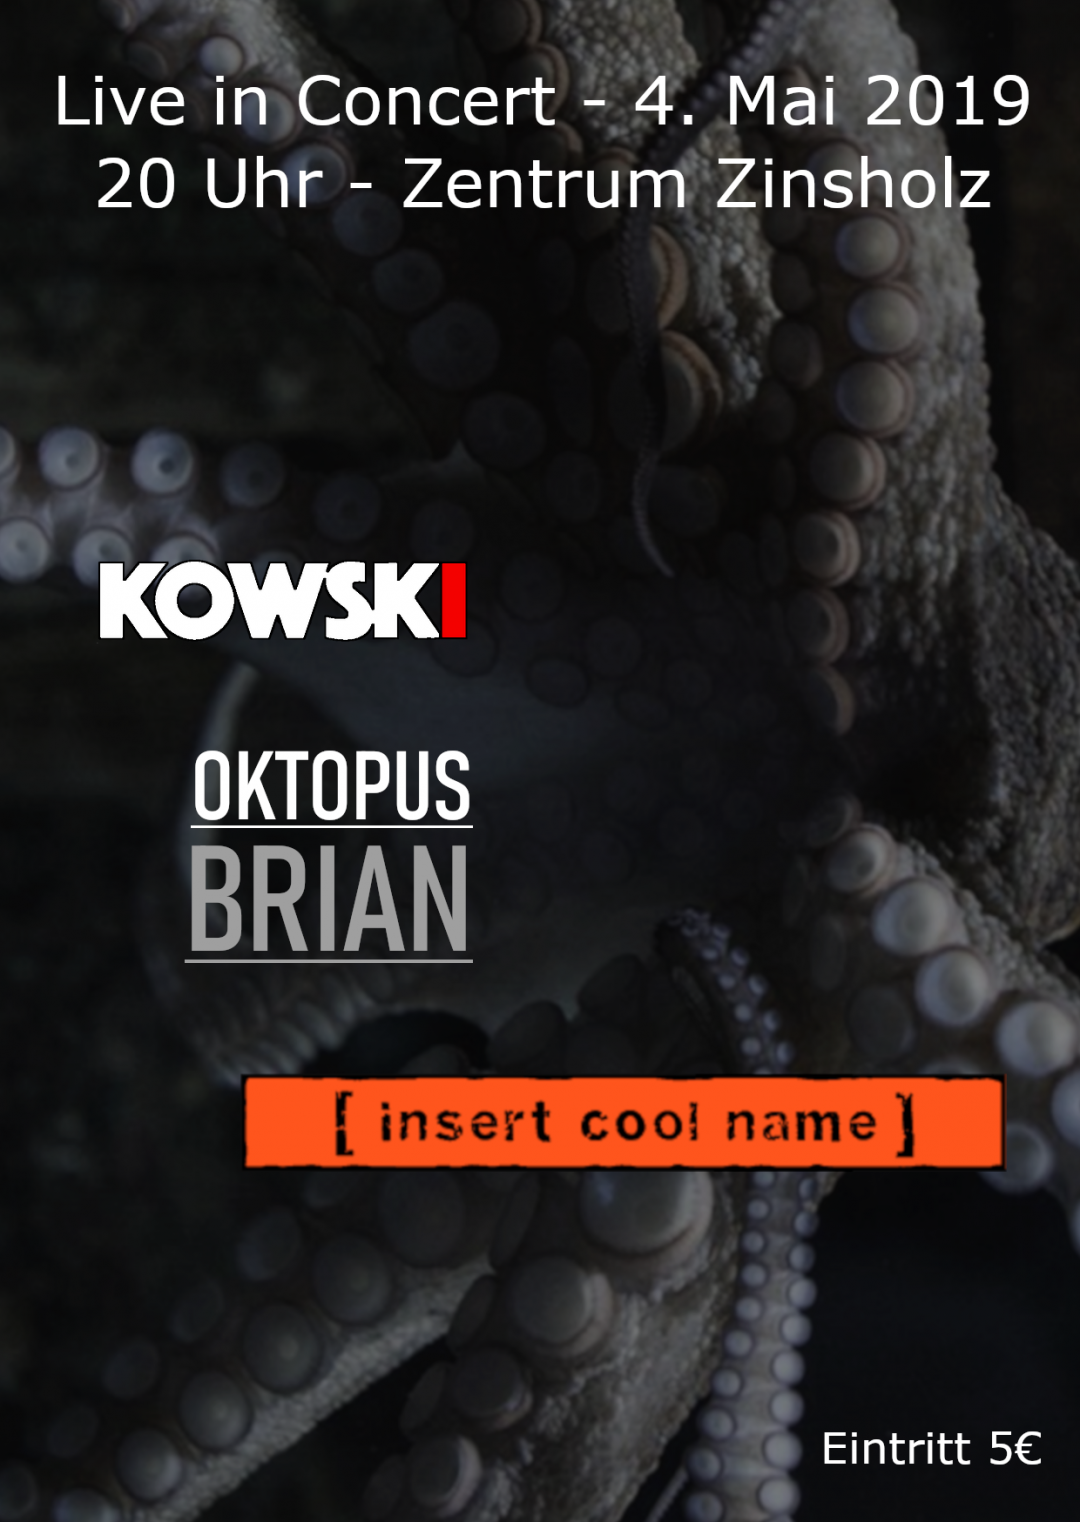 Oktopus Brian – Live in Concert 4. Mai